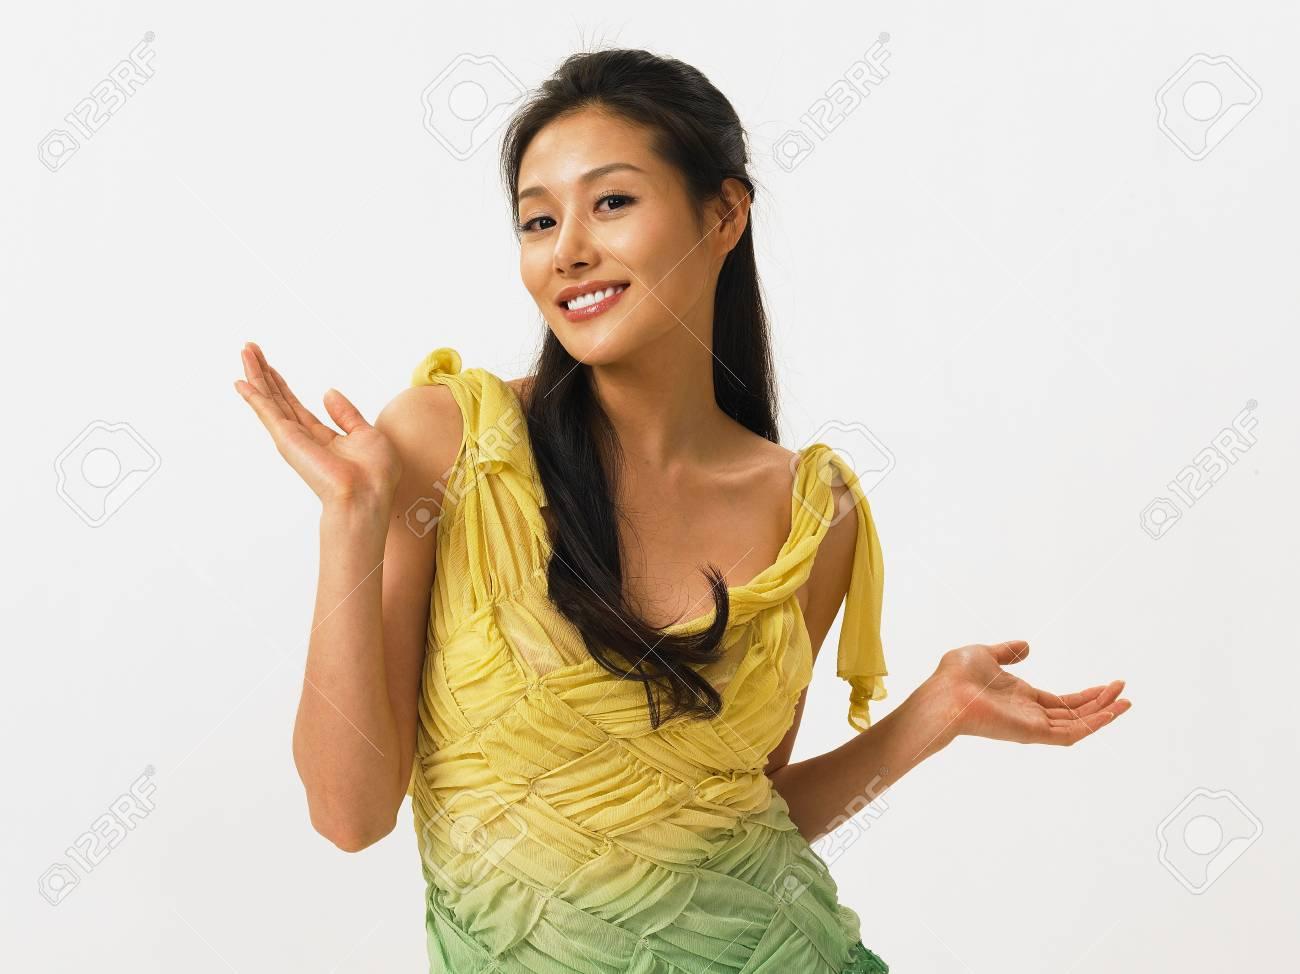 Vestido verde moda asiatica